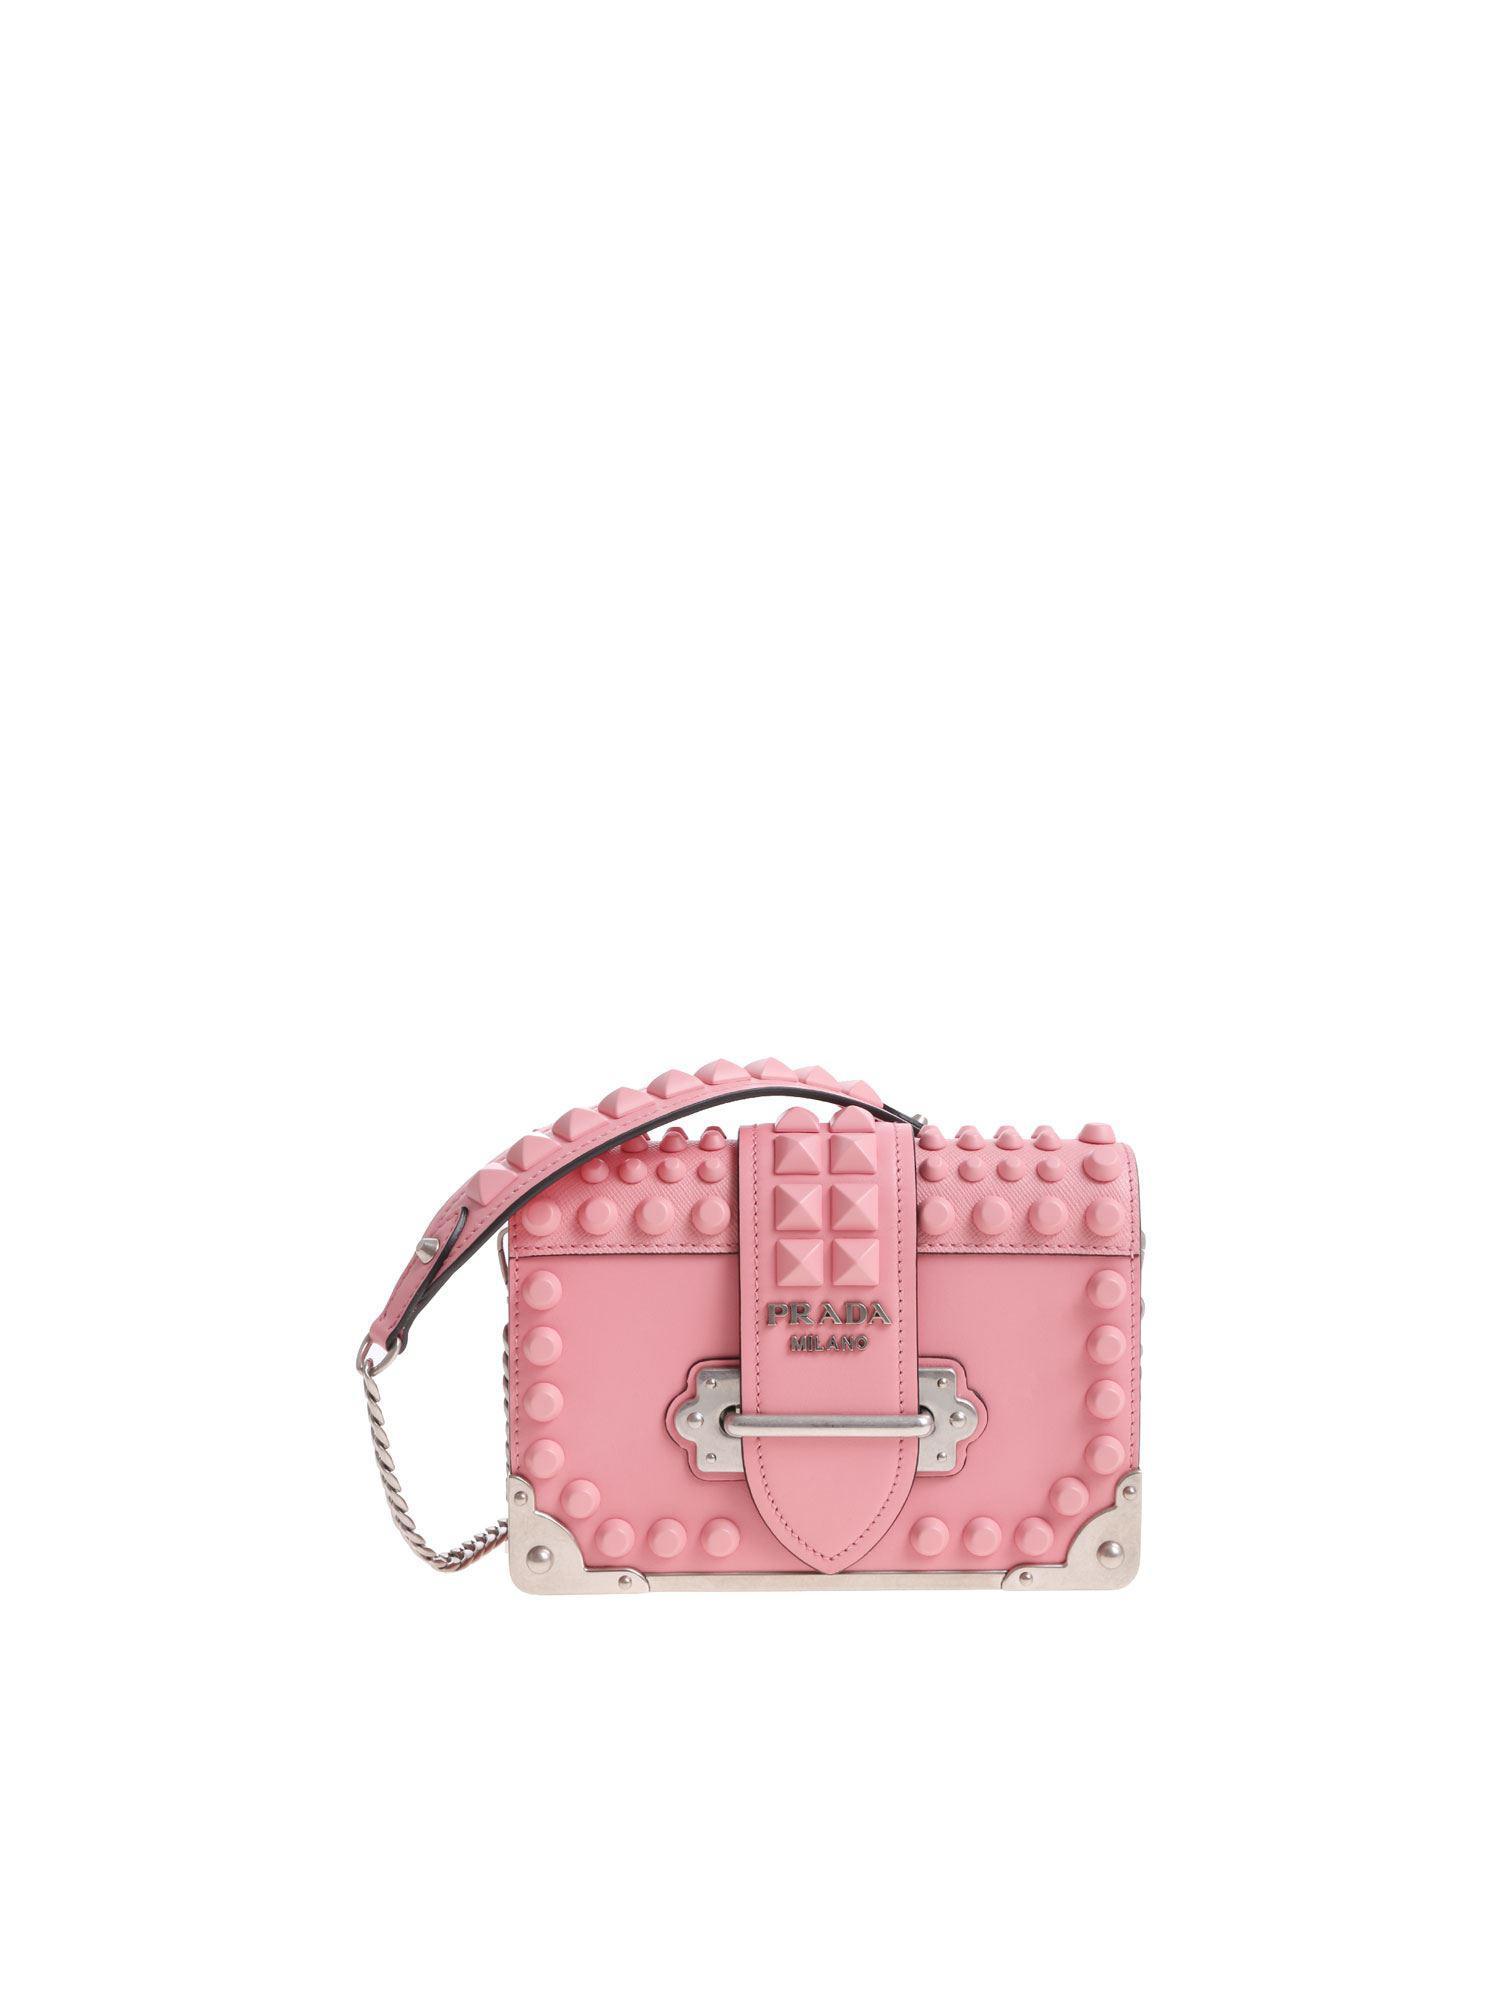 3379c8d855b5 Prada Cahier Pink Shoulder Bag in Pink - Lyst